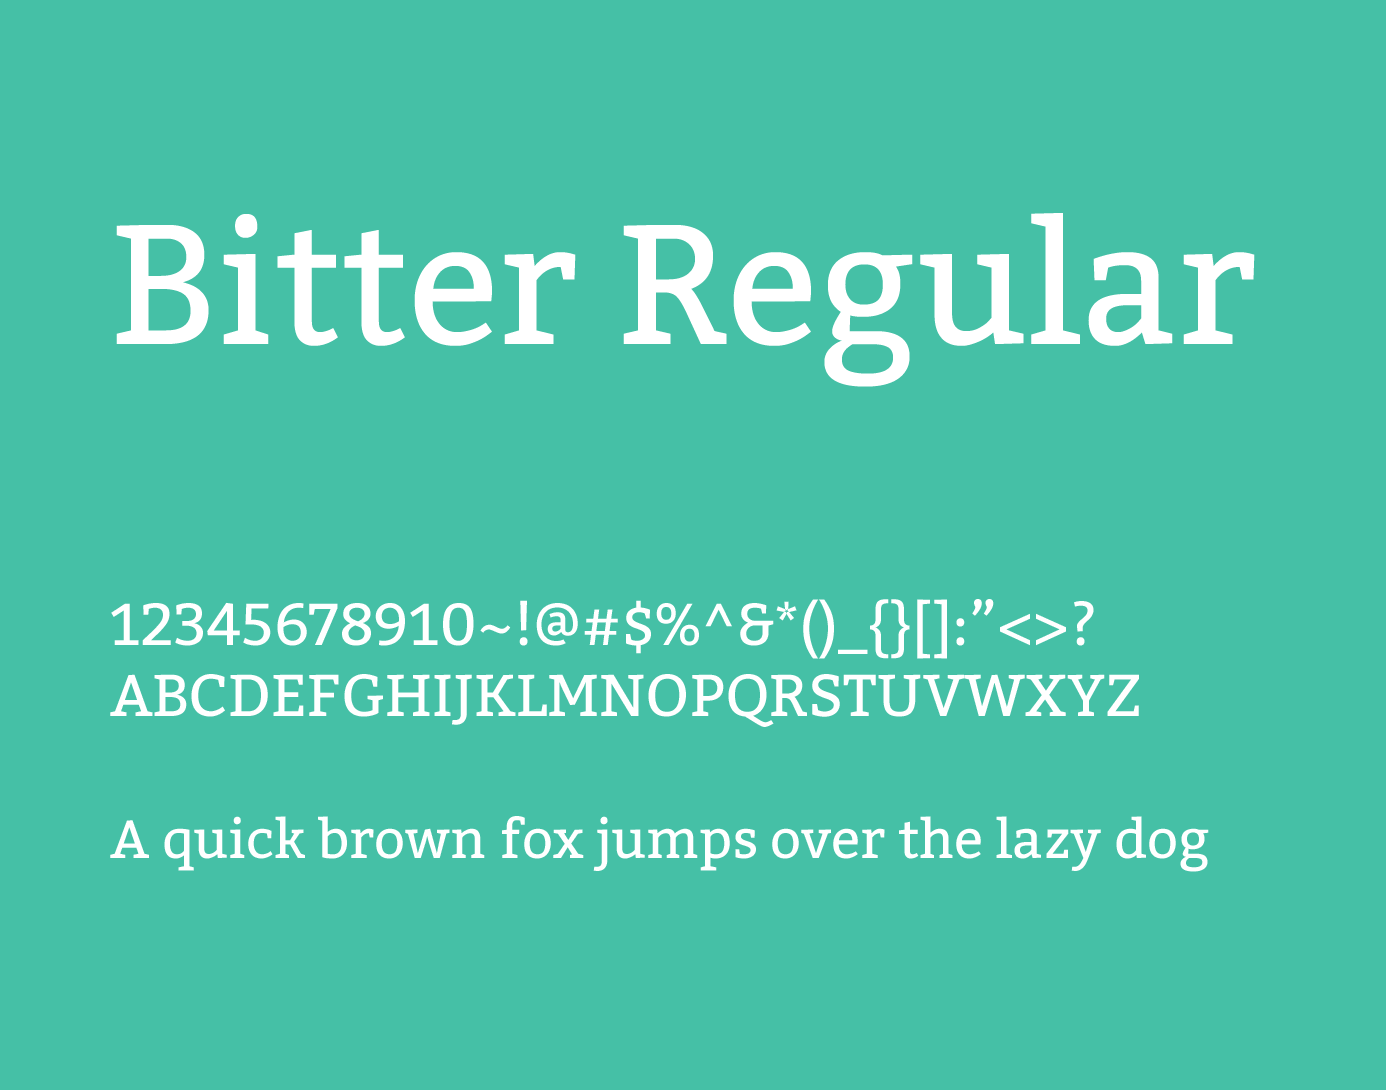 bitter regular